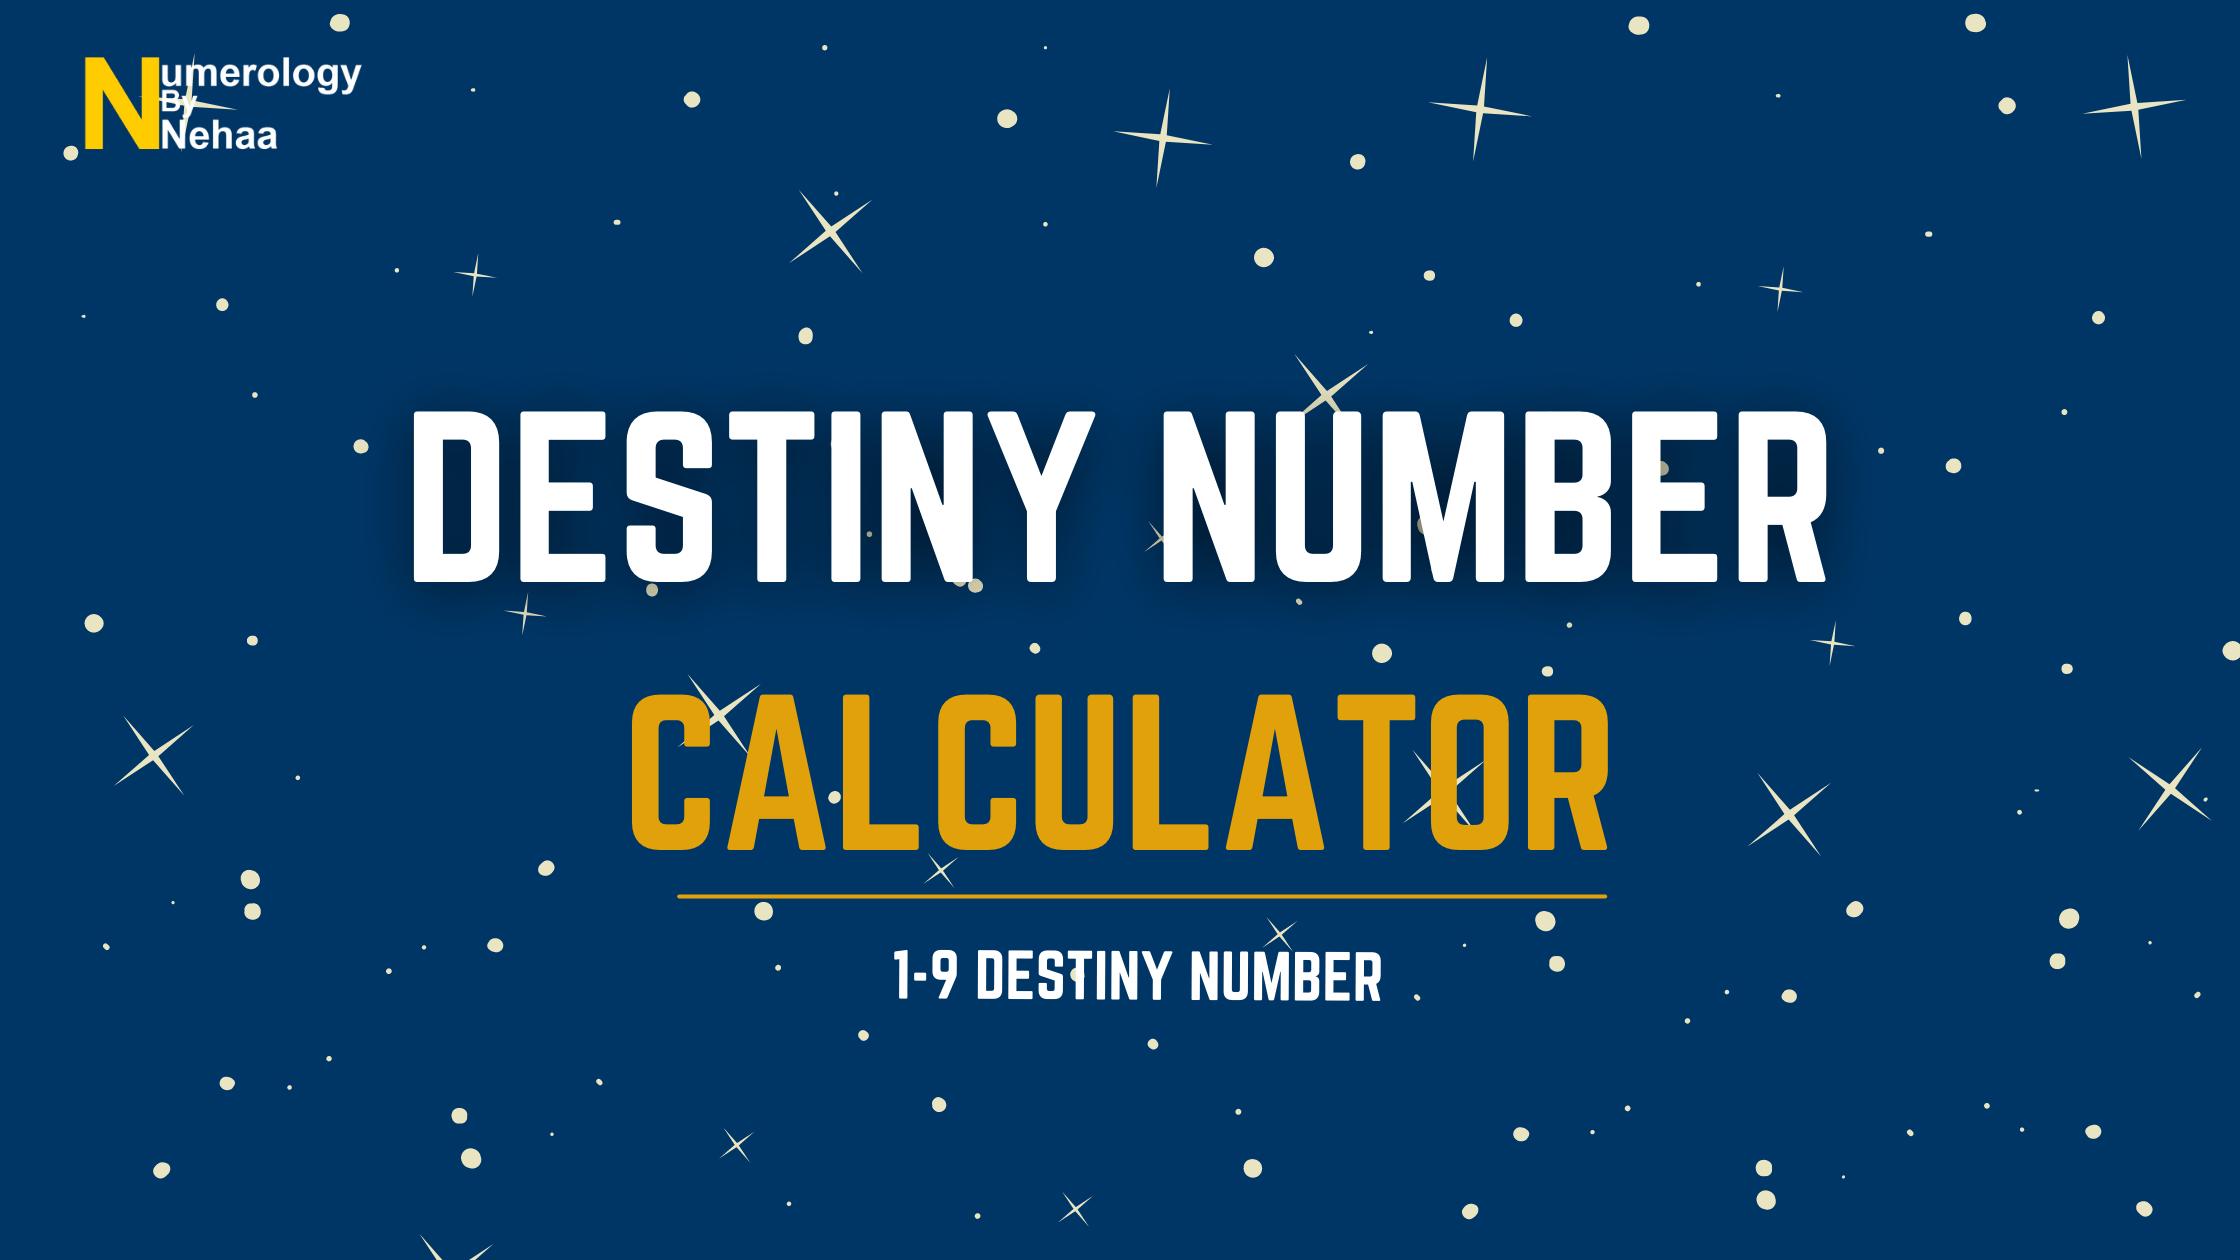 Destiny Number Calculator